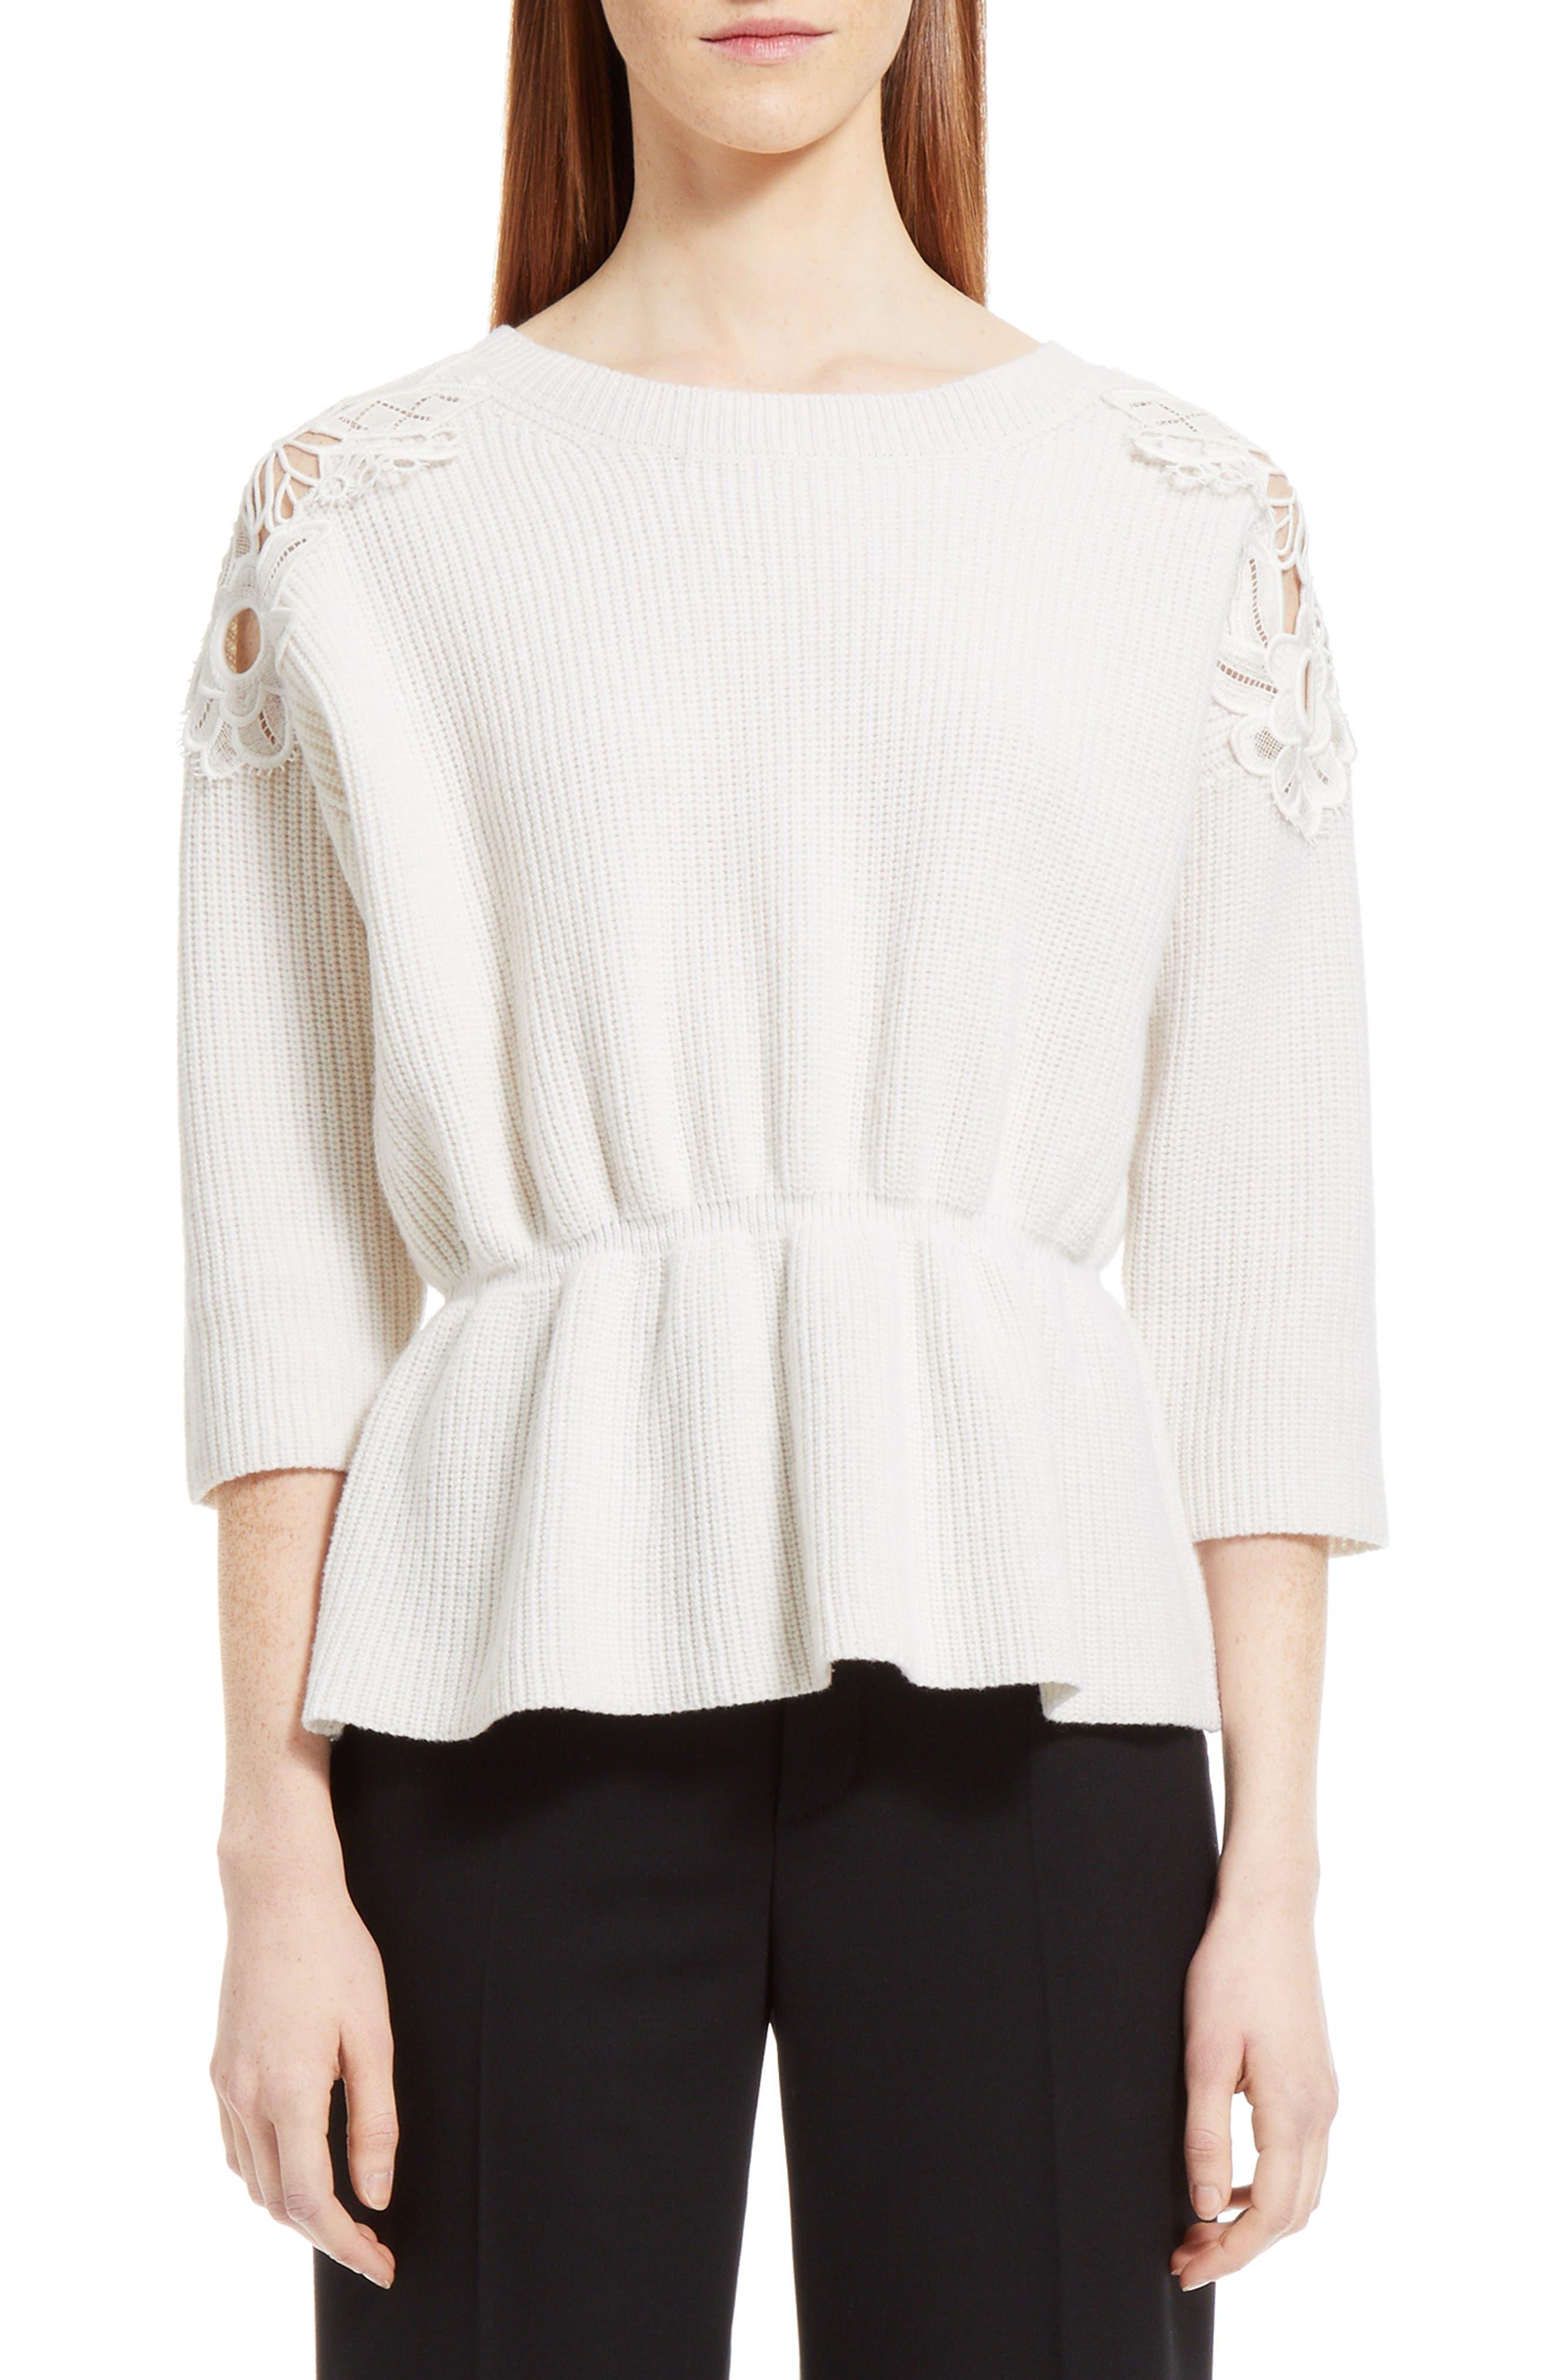 Main Image - Chloé Lace Trim Merino Wool & Cashmere Sweater